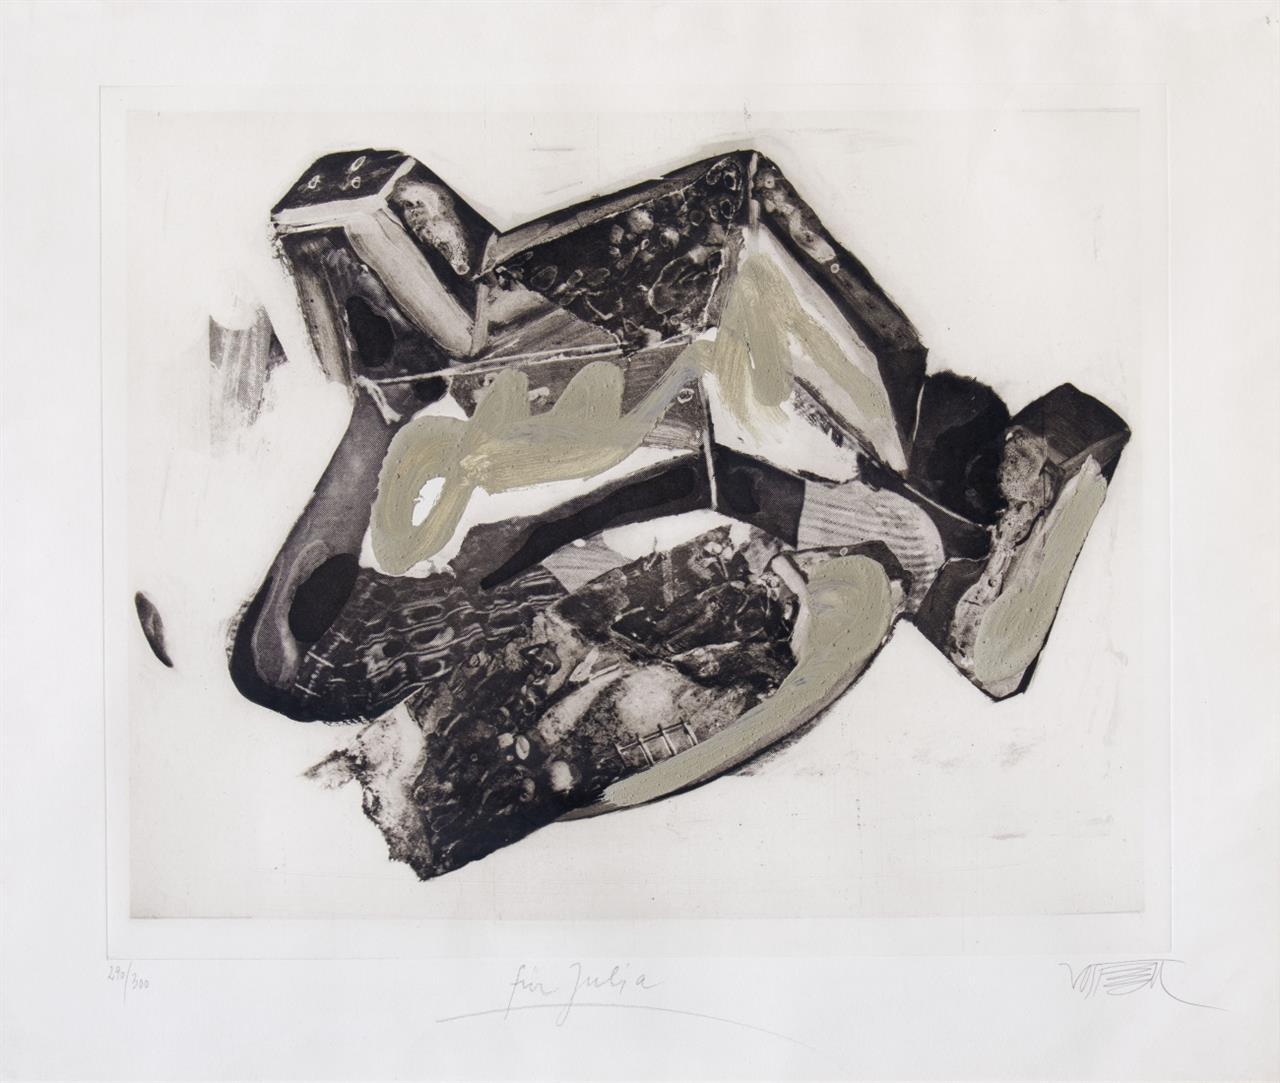 Wolf Vostell. Betonengel. (1987).  Heliogravure, Zement. Signiert. Ex. 290/300.